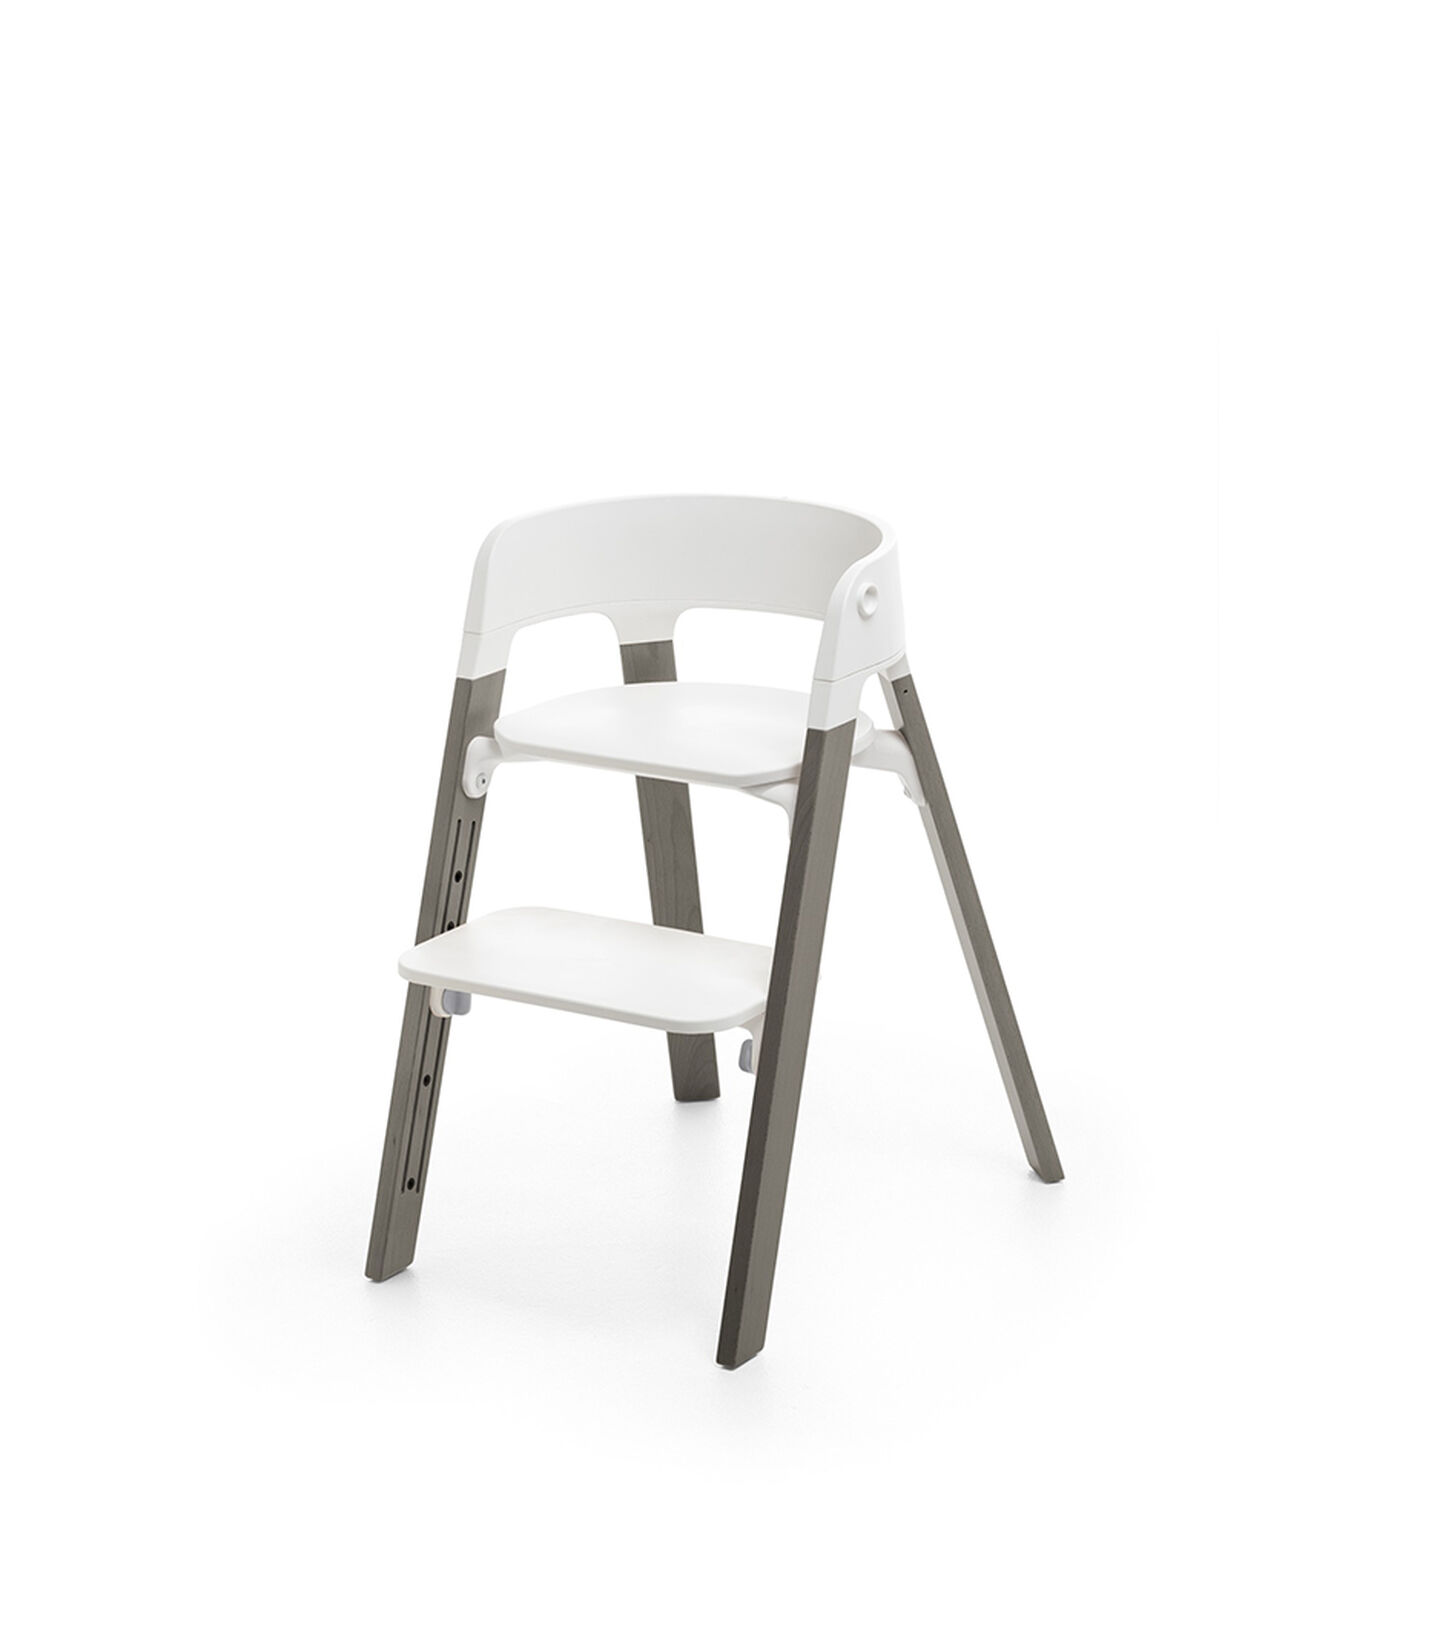 Stokke® Steps™ Chair White Hazy Grey, White/Hazy Grey, mainview view 1